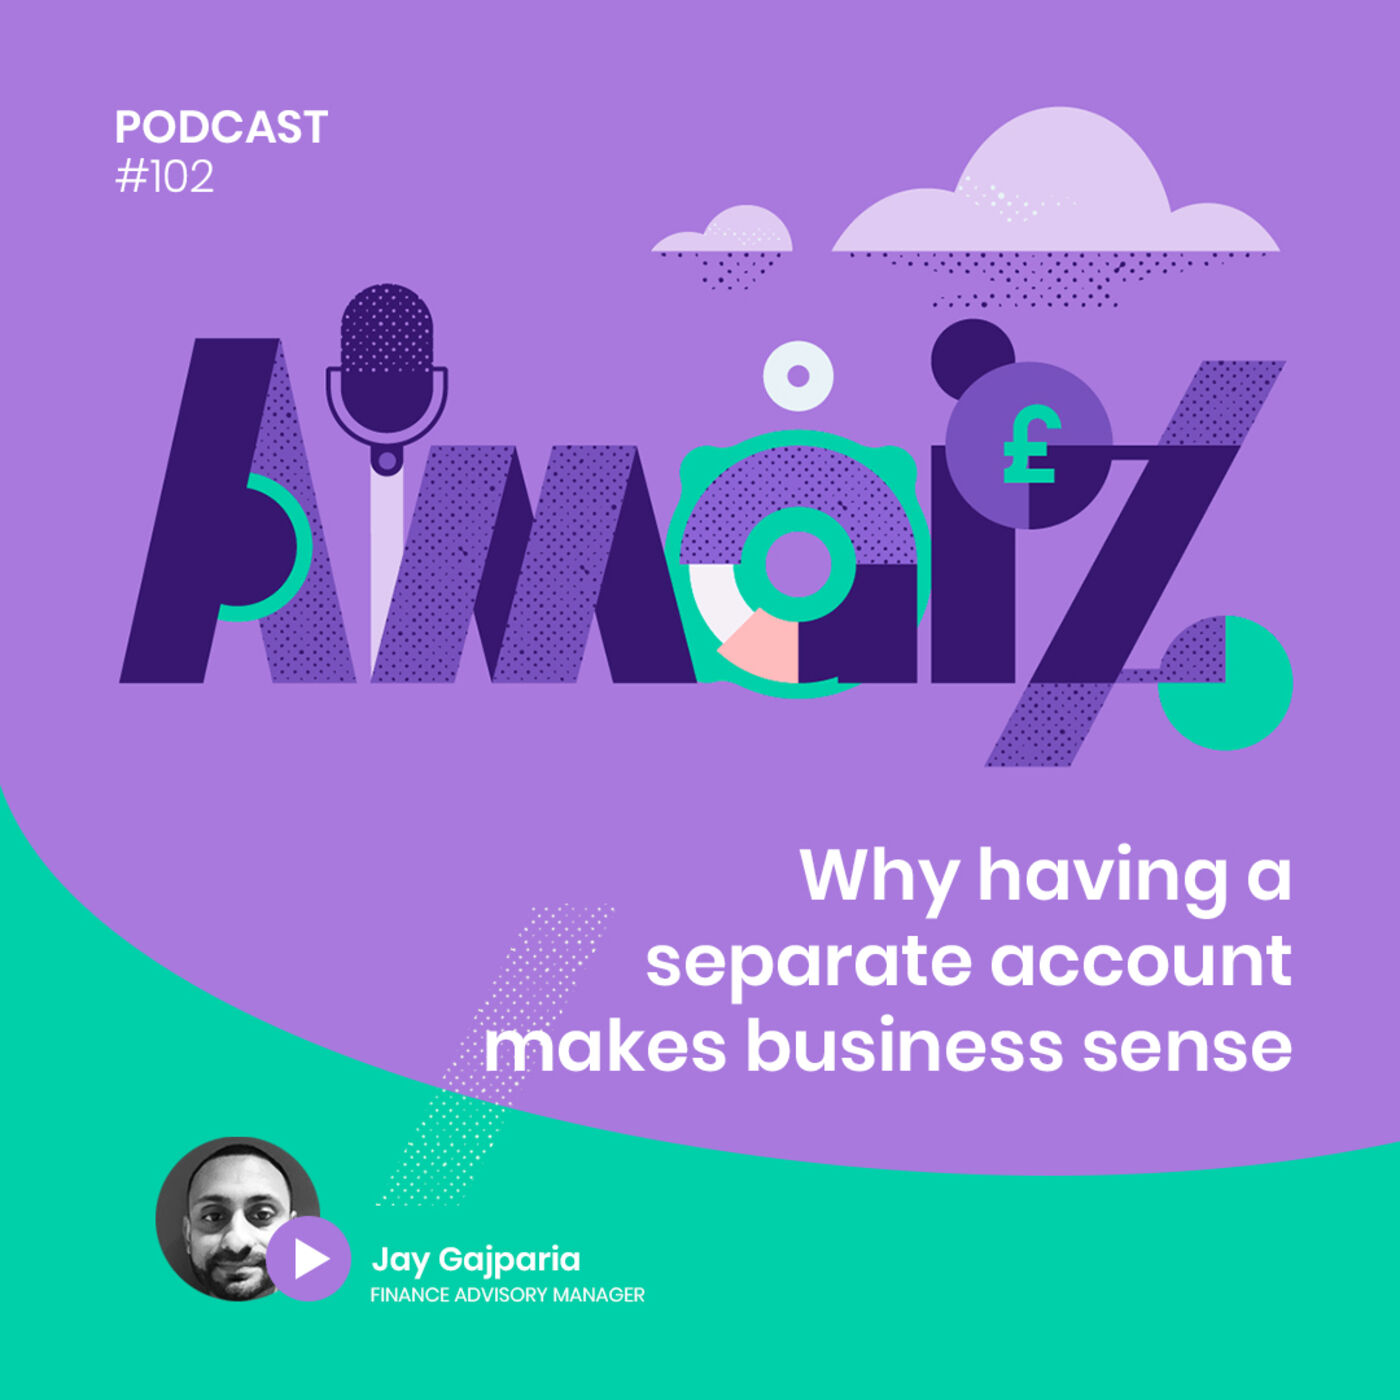 Amaiz: Why have a separate account makes business sense